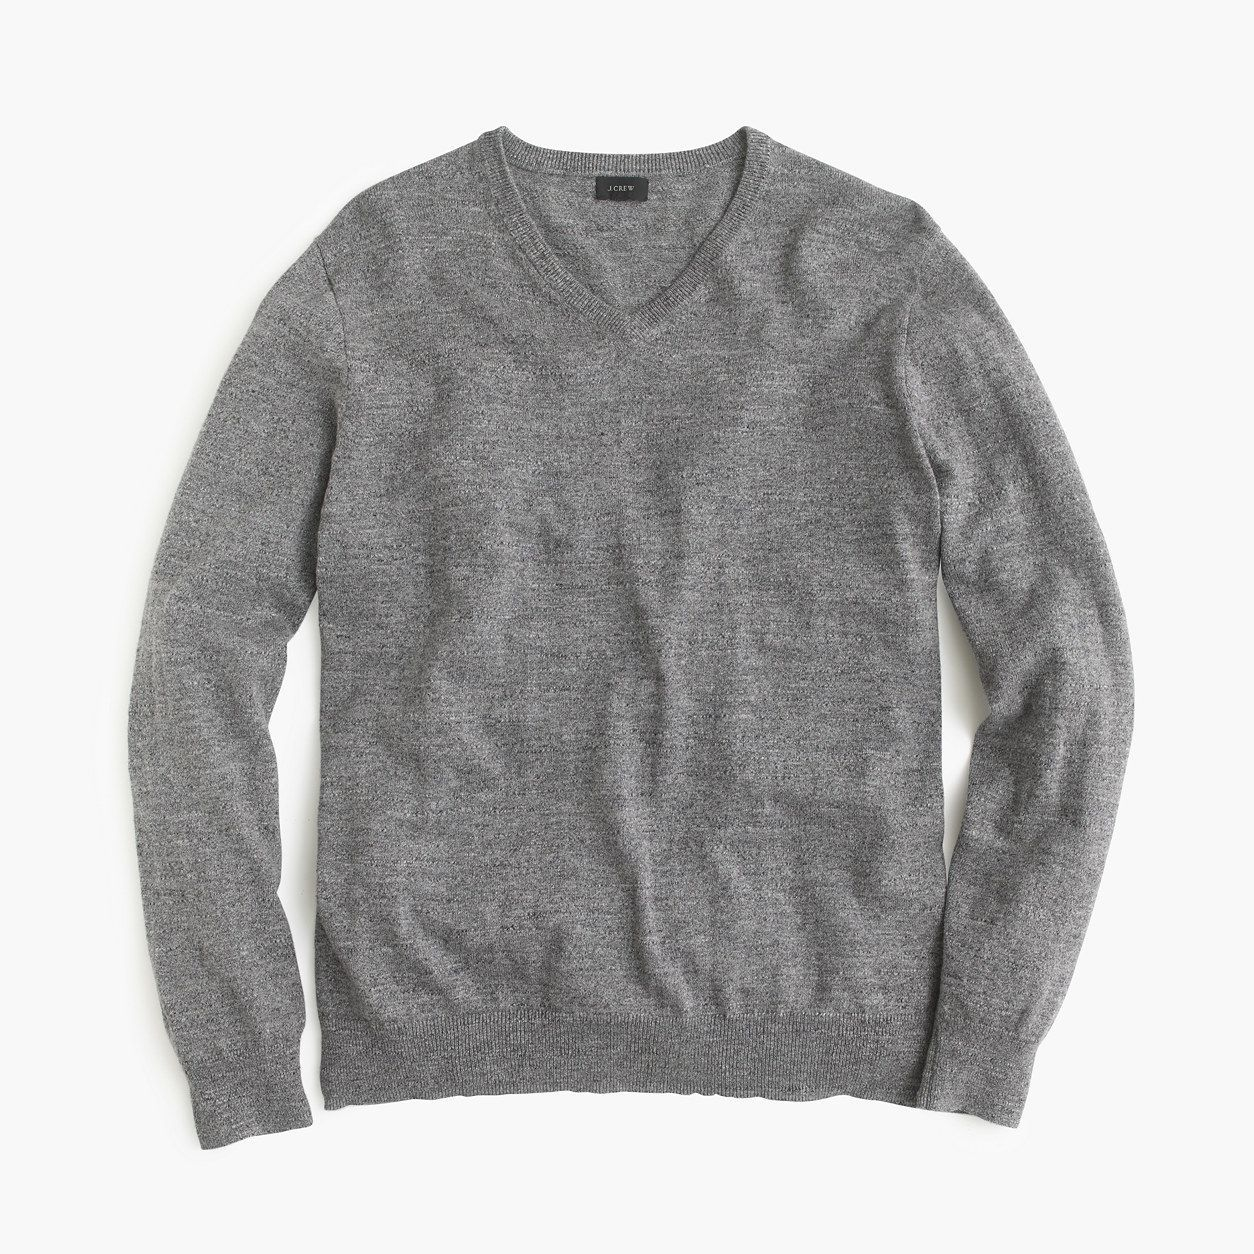 0bb17df24 J.Crew Mens Tall Rugged Cotton V-Neck Sweater (Size XL Tall ...